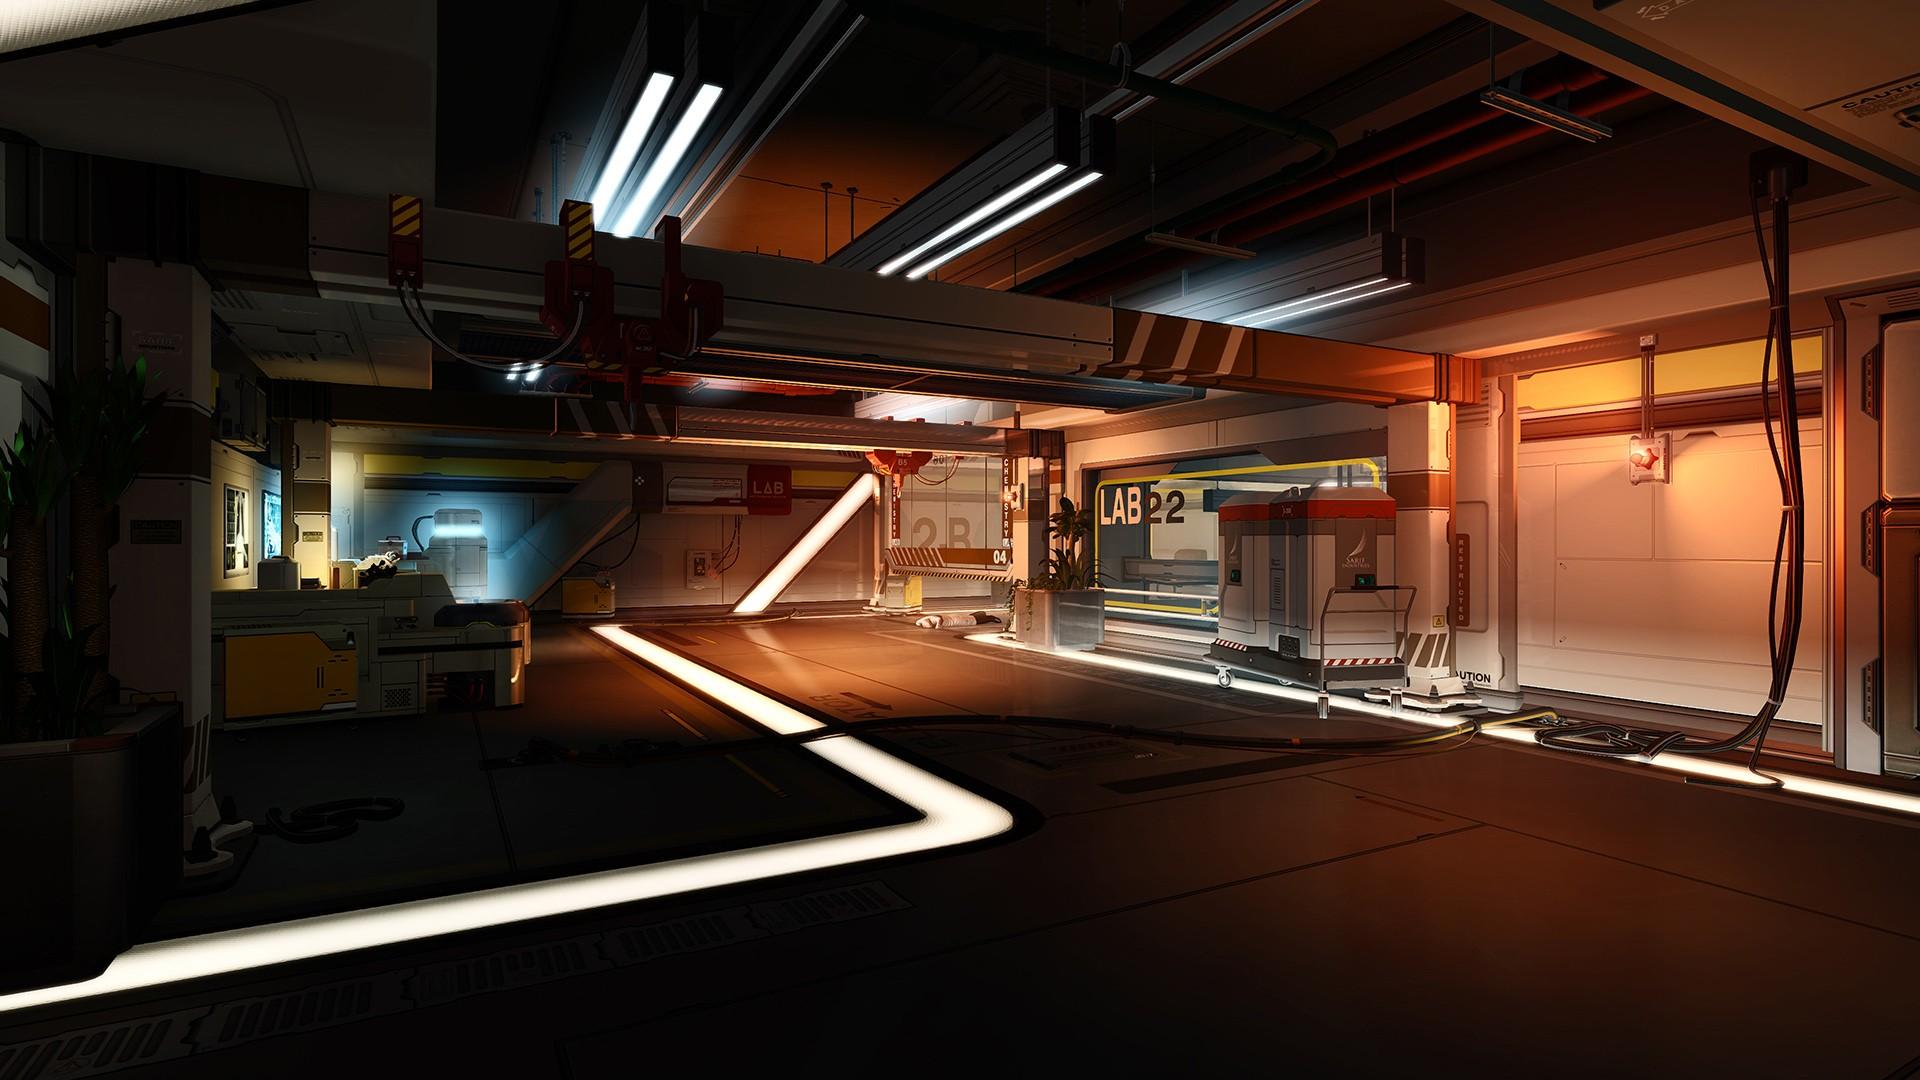 Wallpaper Video Games Architecture Cyberpunk Room